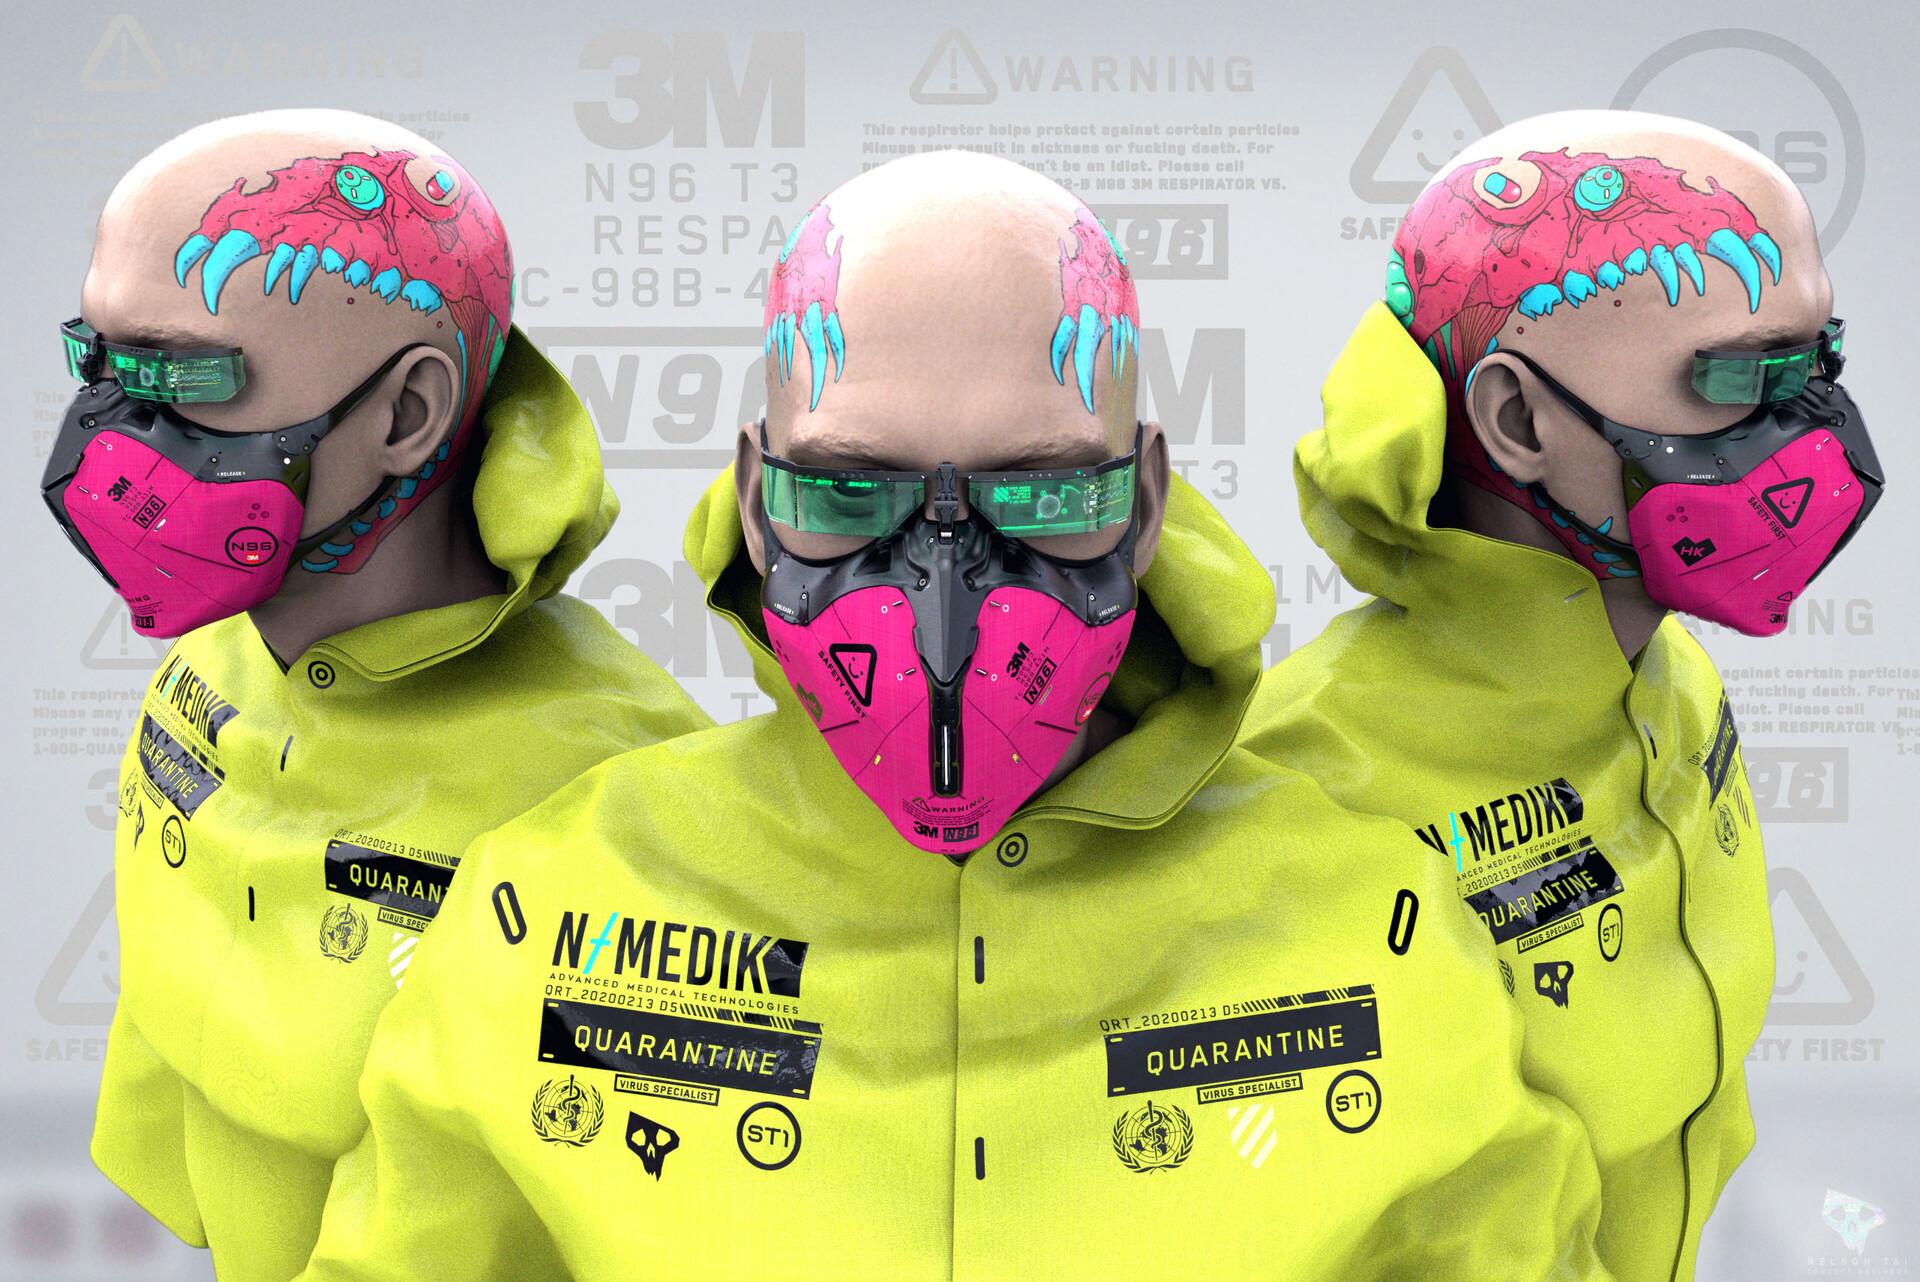 Hardcore Heisenberg. Gotta have matching head tat with the respirator.